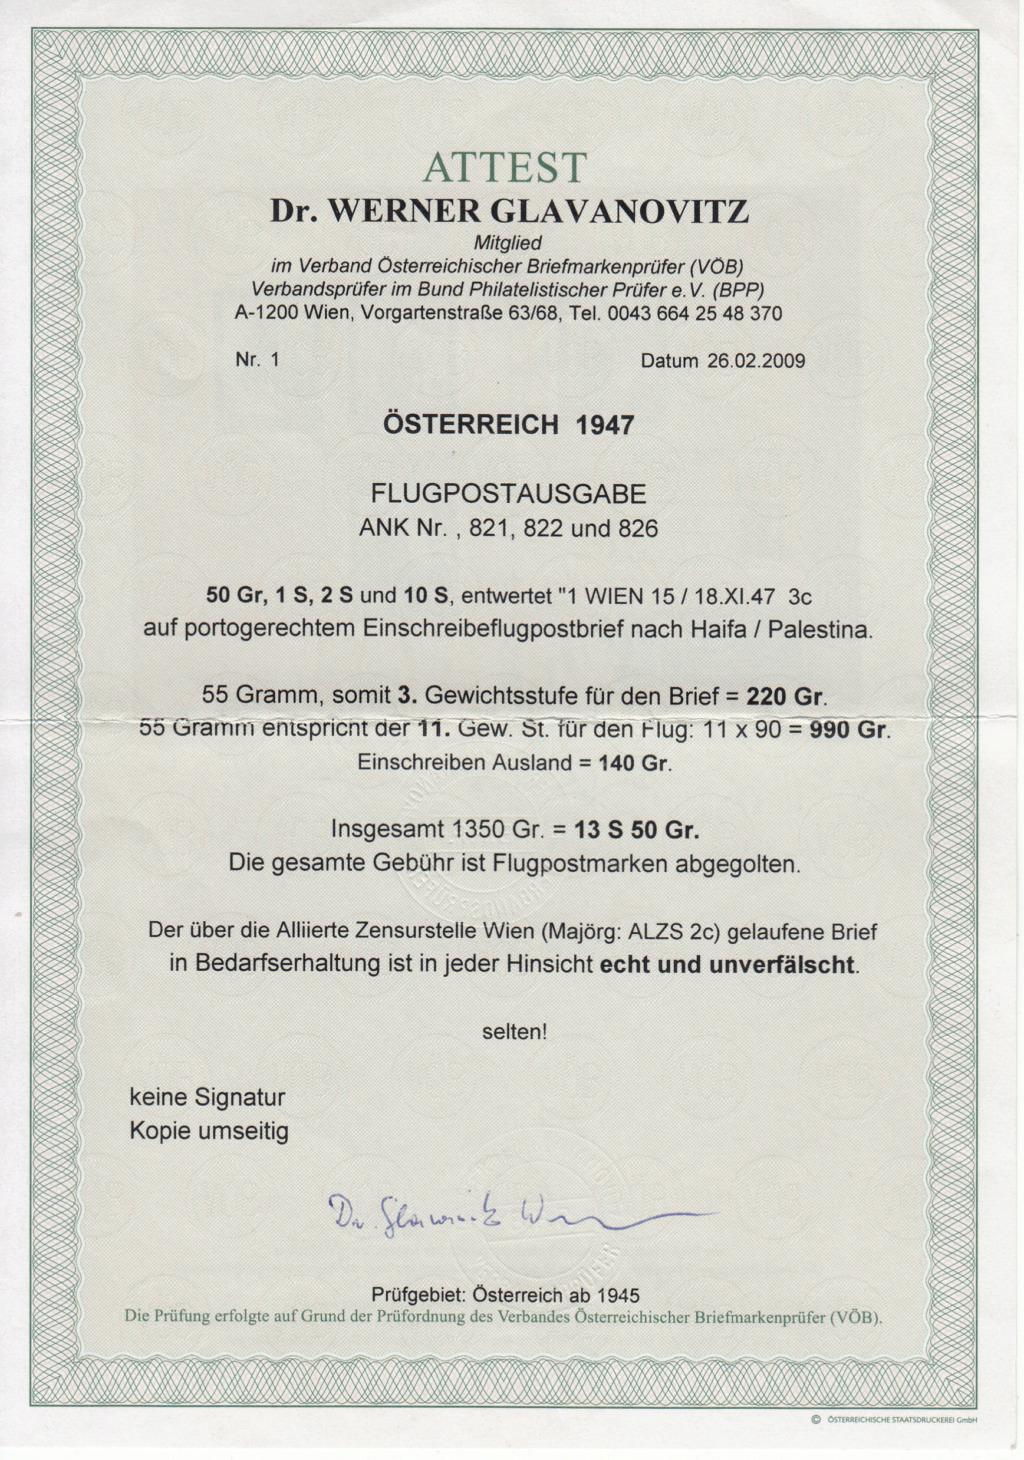 Flugpostausgabe 1947 Img_0391